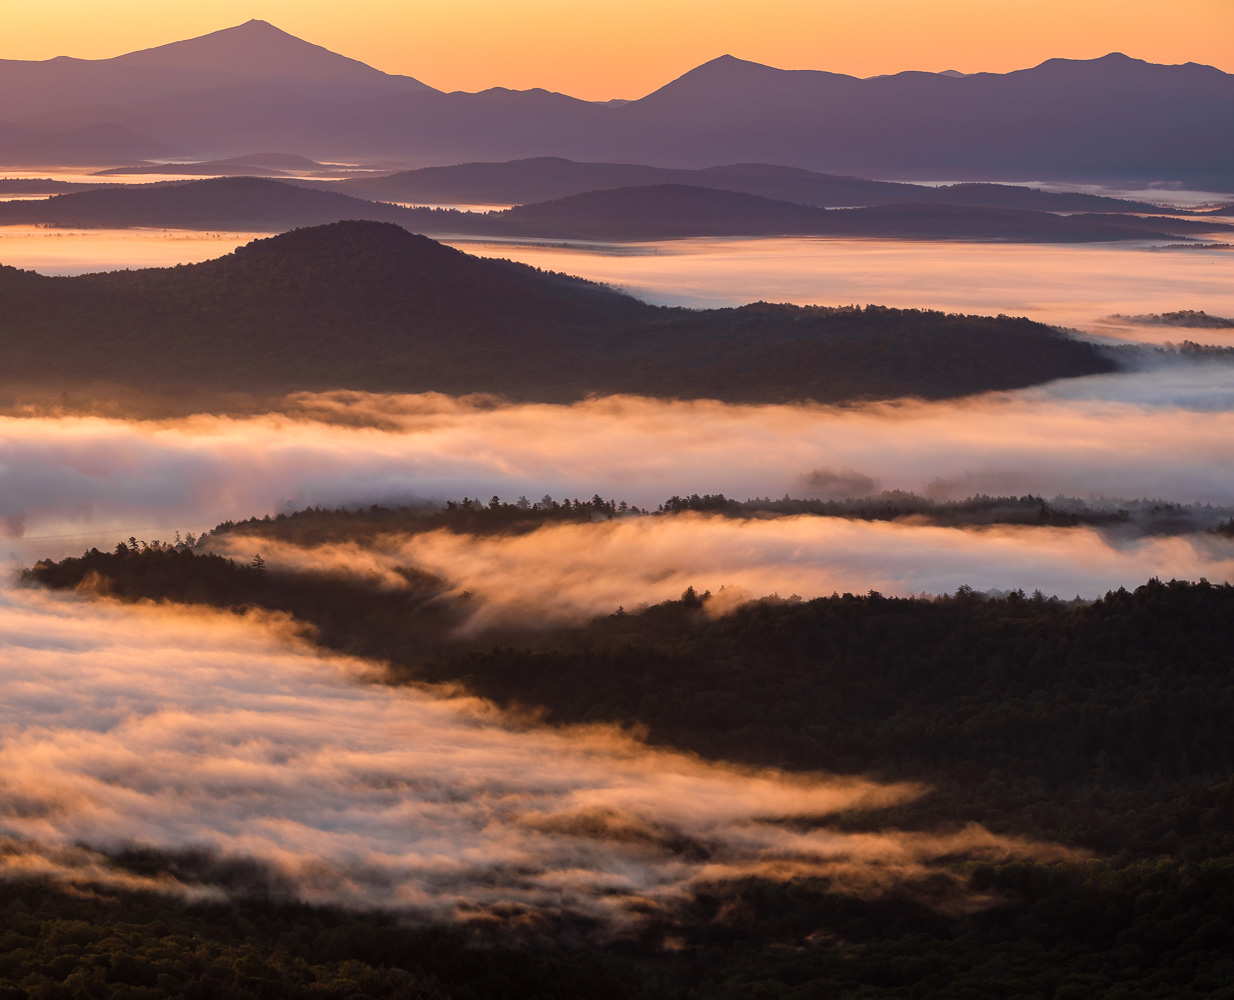 Sunrise from Saint Regis Mountain